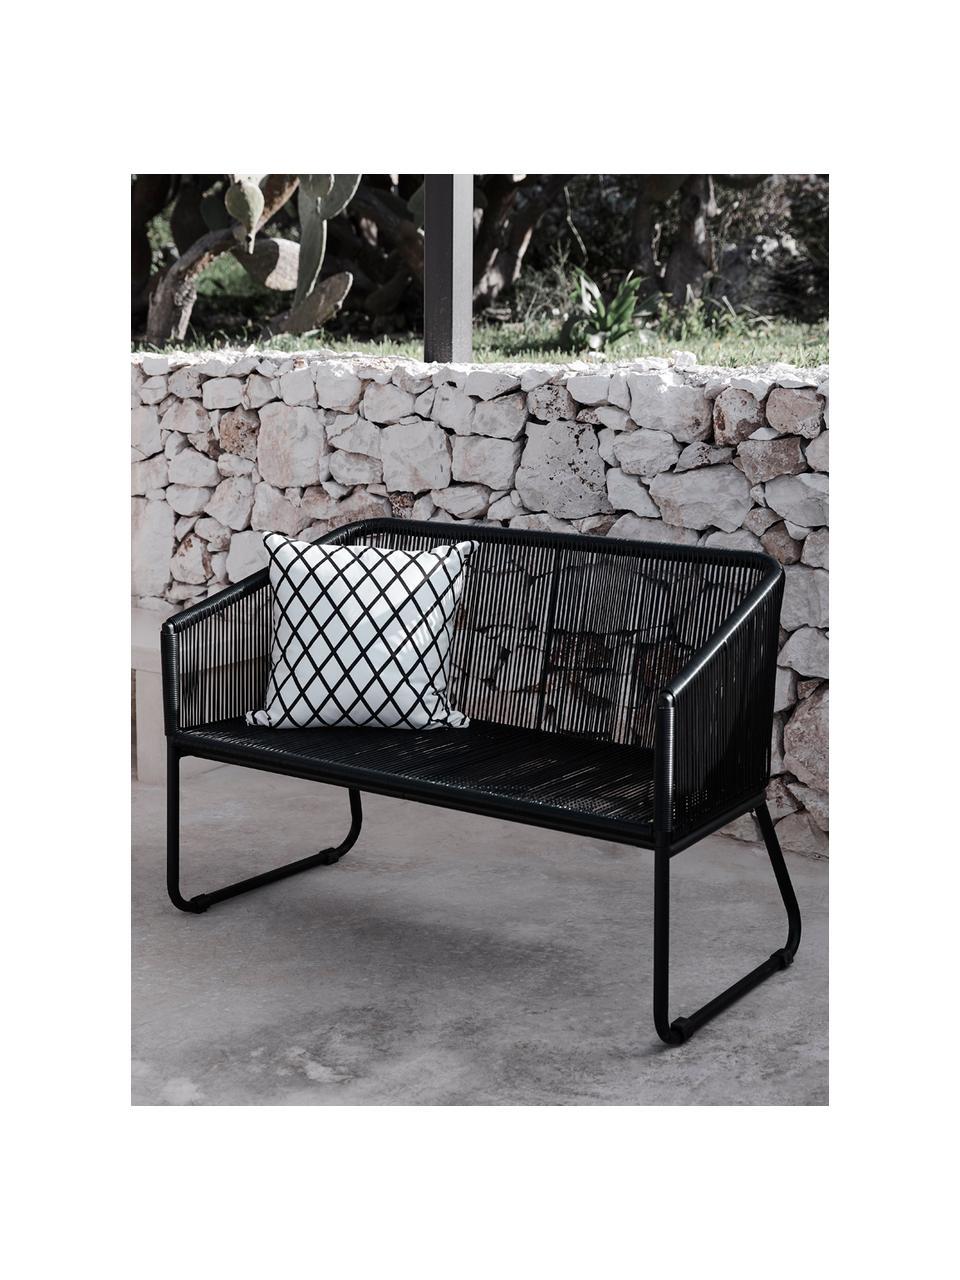 Garten-Sitzbank Moa mit Kunststoff-Geflecht, Sitzfläche: Polyethylen-Geflecht, Gestell: Metall, pulverbeschichtet, Schwarz, B 118 x T 64 cm